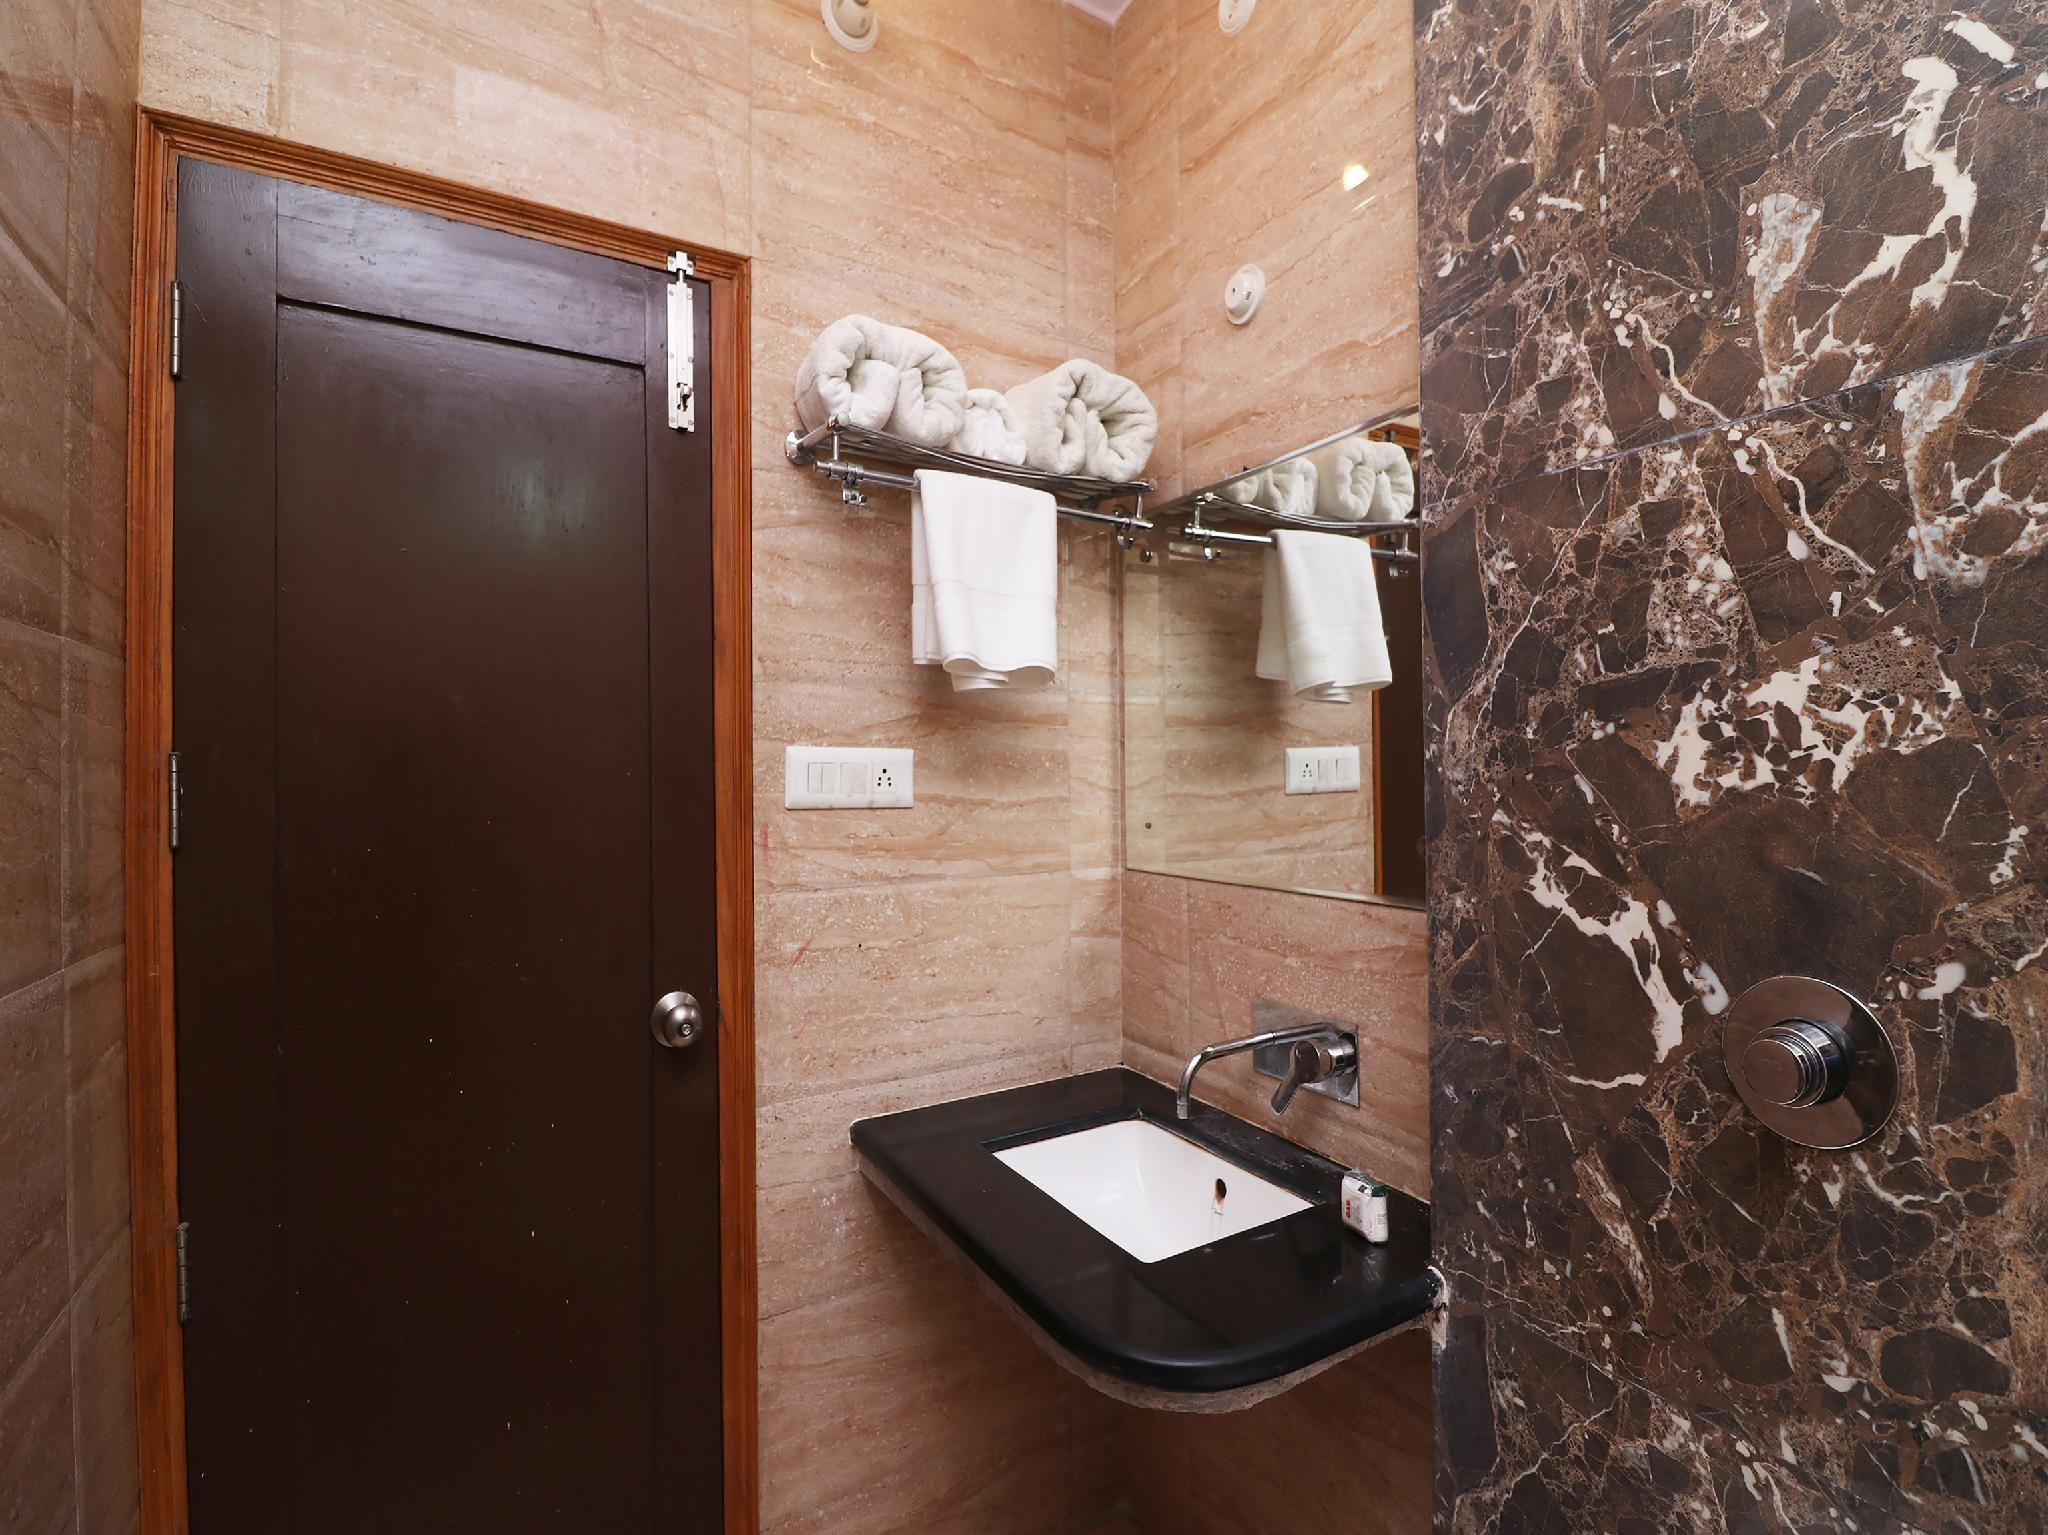 OYO 29029 Rc Hotel, Rewari